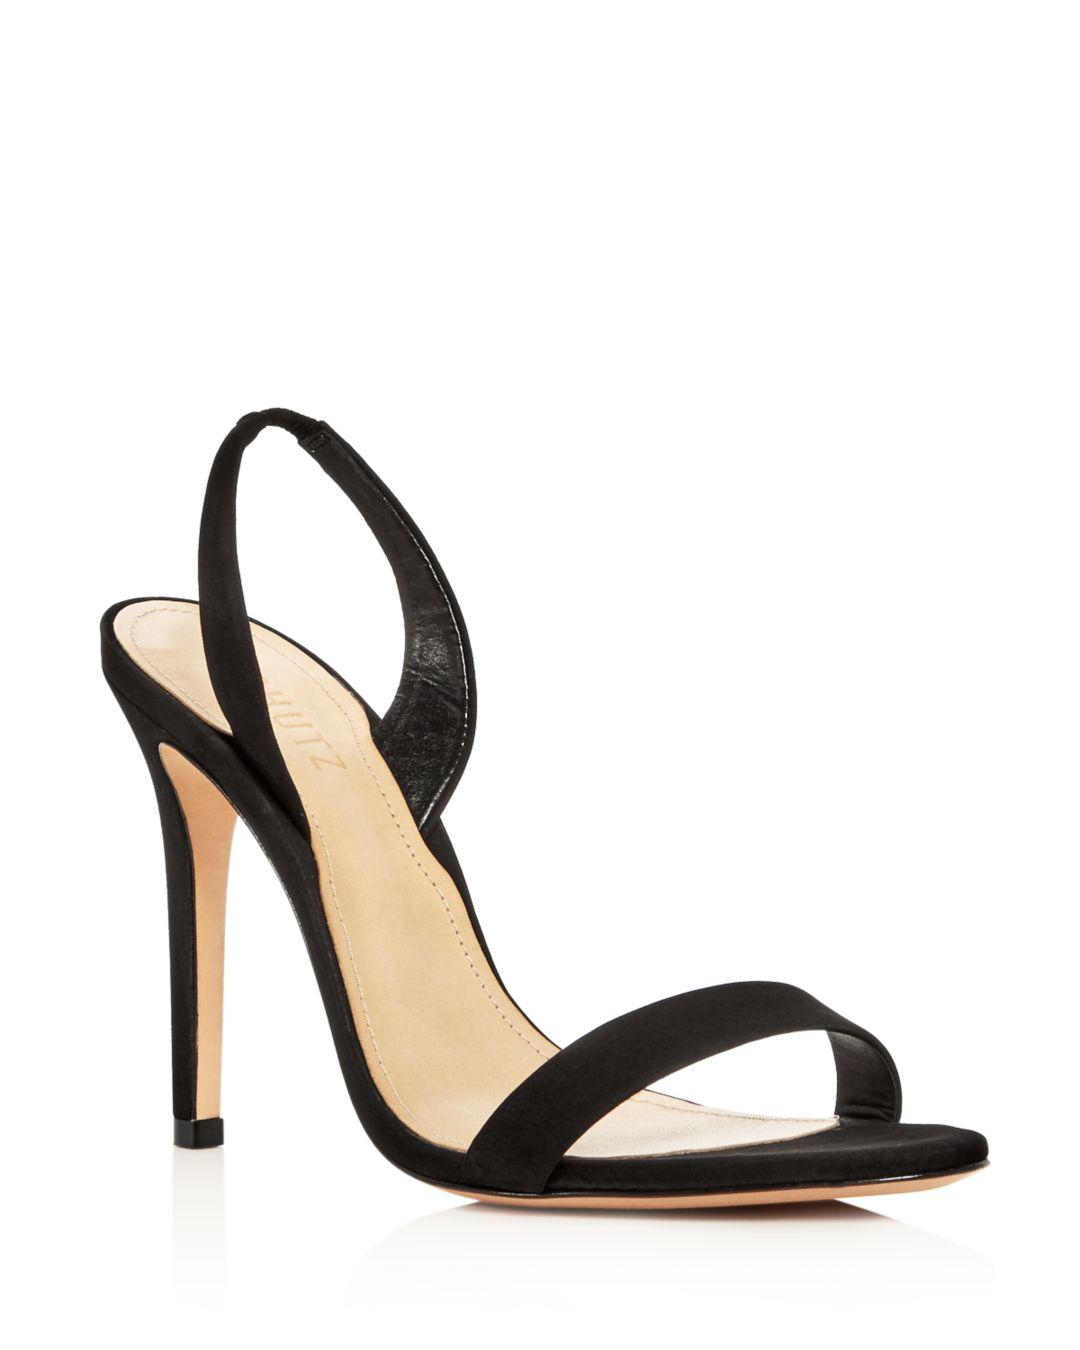 bb7498cb16bf Lyst - Schutz Women s Luriane Slingback High-heel Sandals in Black